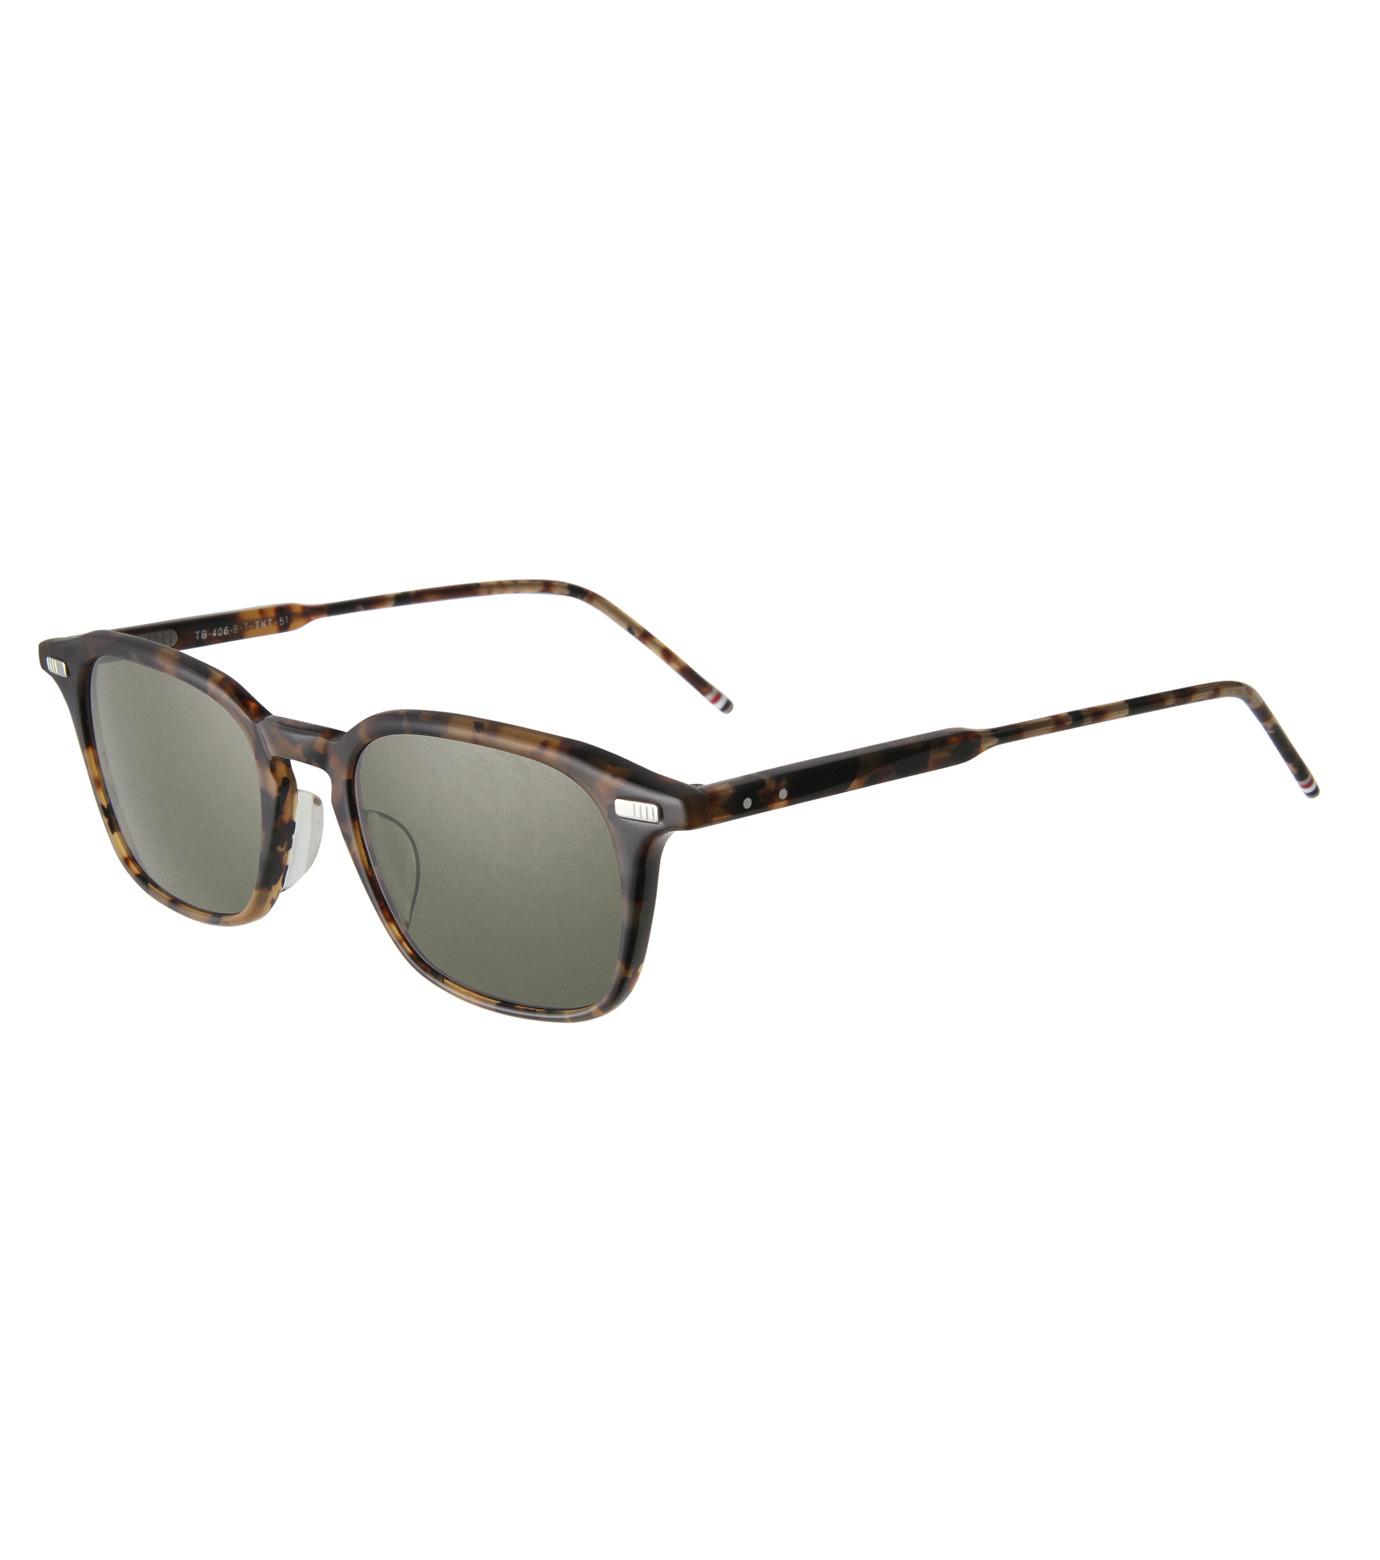 Thom Browne Eye Wear(トム・ブラウン・アイウェア)のWellington-BROWN(アイウェア/eyewear)-TB-406-B-T-42 拡大詳細画像1